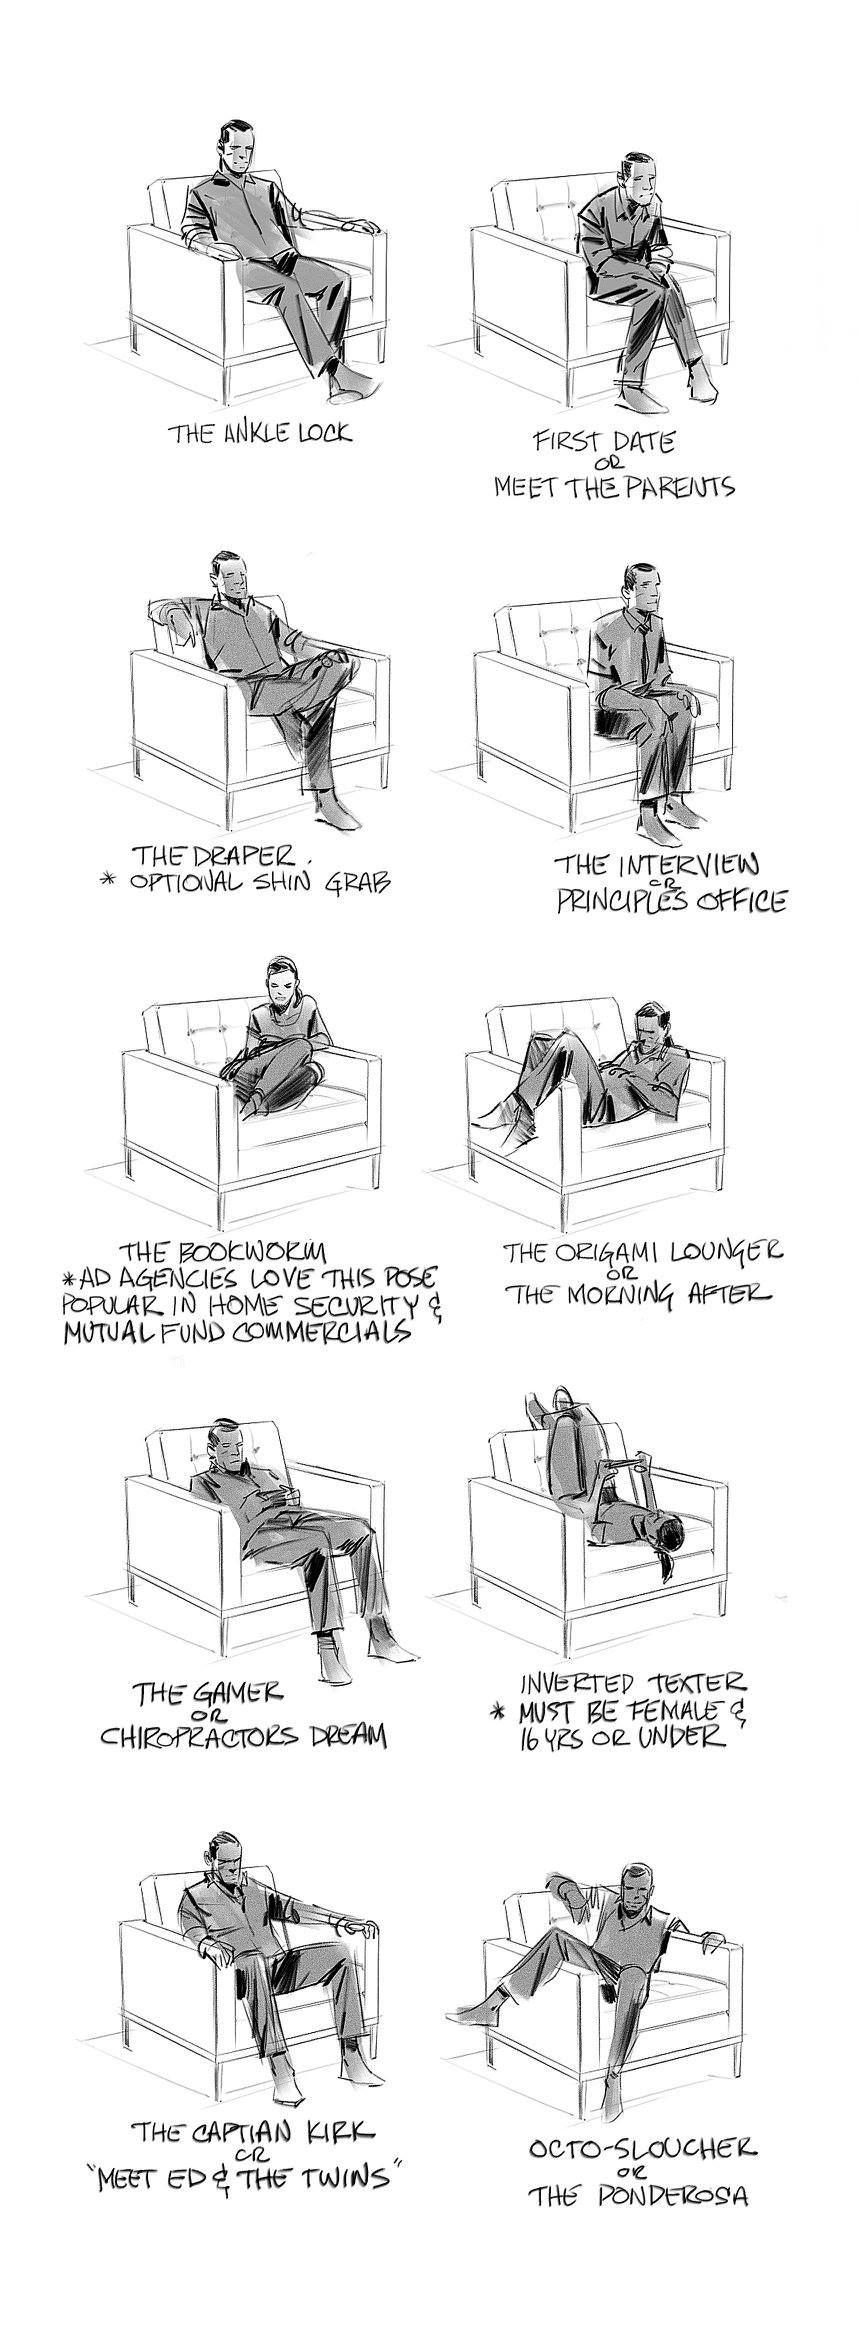 Maneras de sentarse   tas   Pinterest   Anatomía, Dibujo y Dibujar